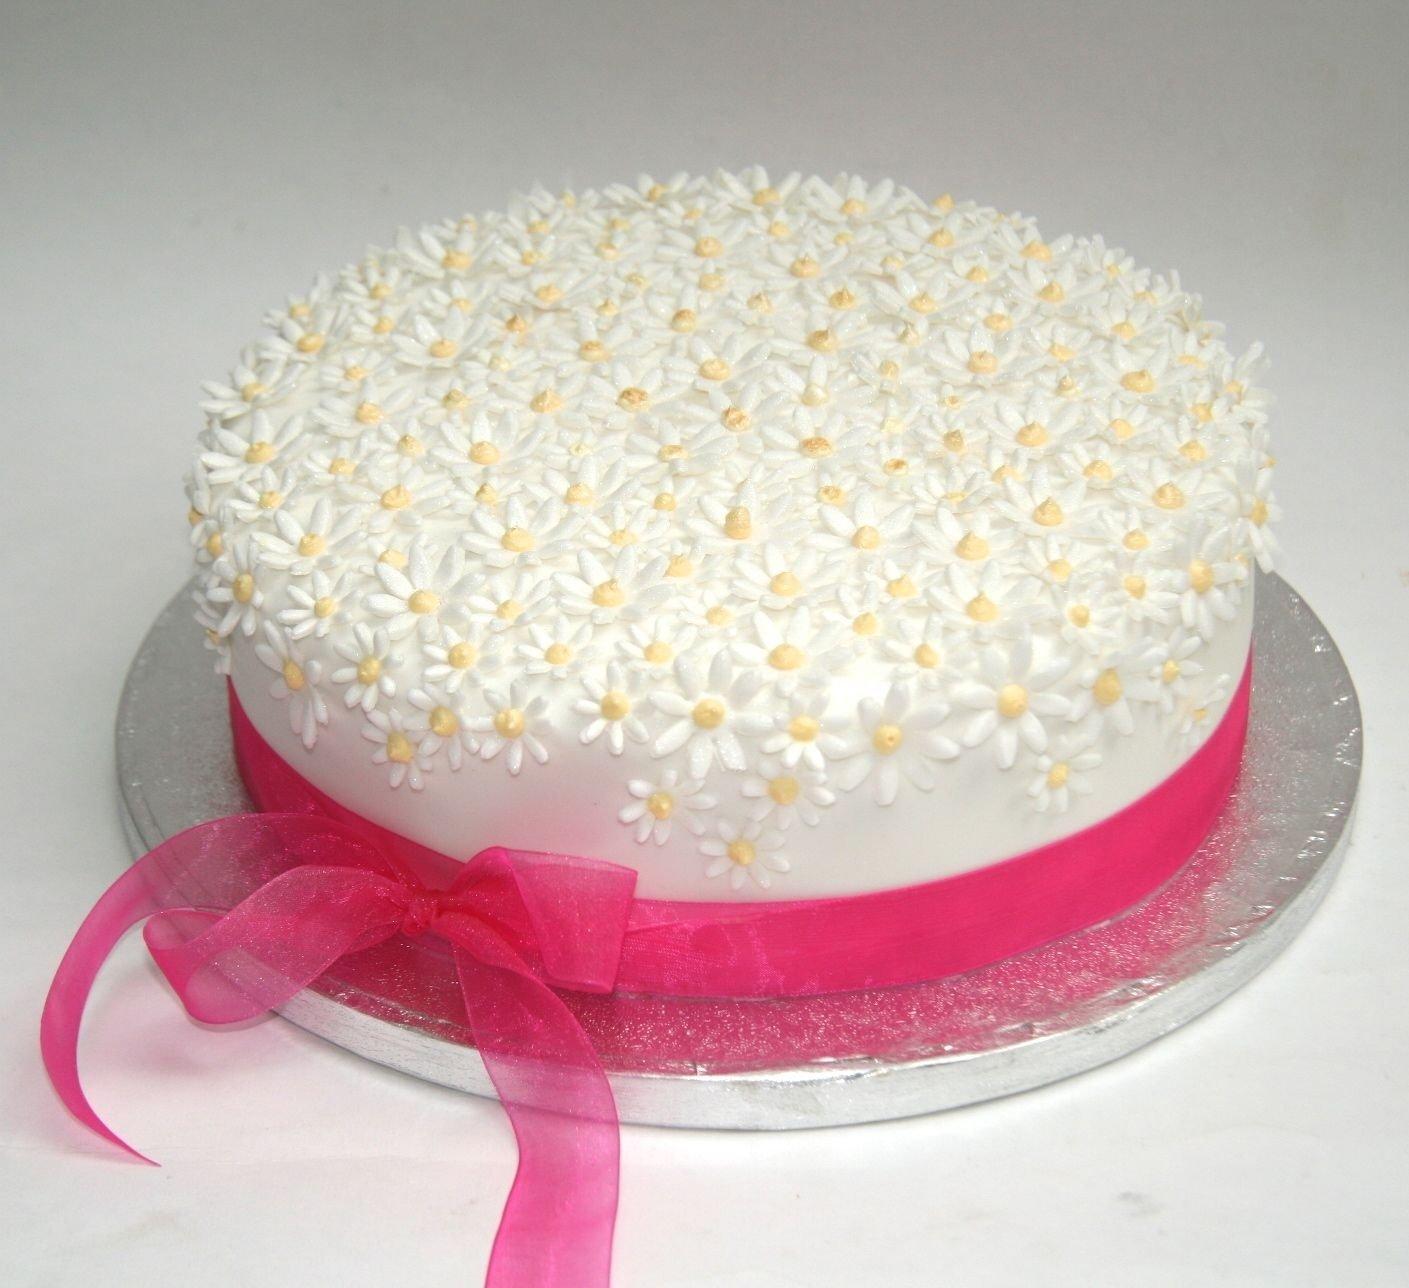 10 Gorgeous Birthday Cake Decorating Ideas For Adults daisy cakes wedding cakes birthday cakes simple white daisy cake 2020